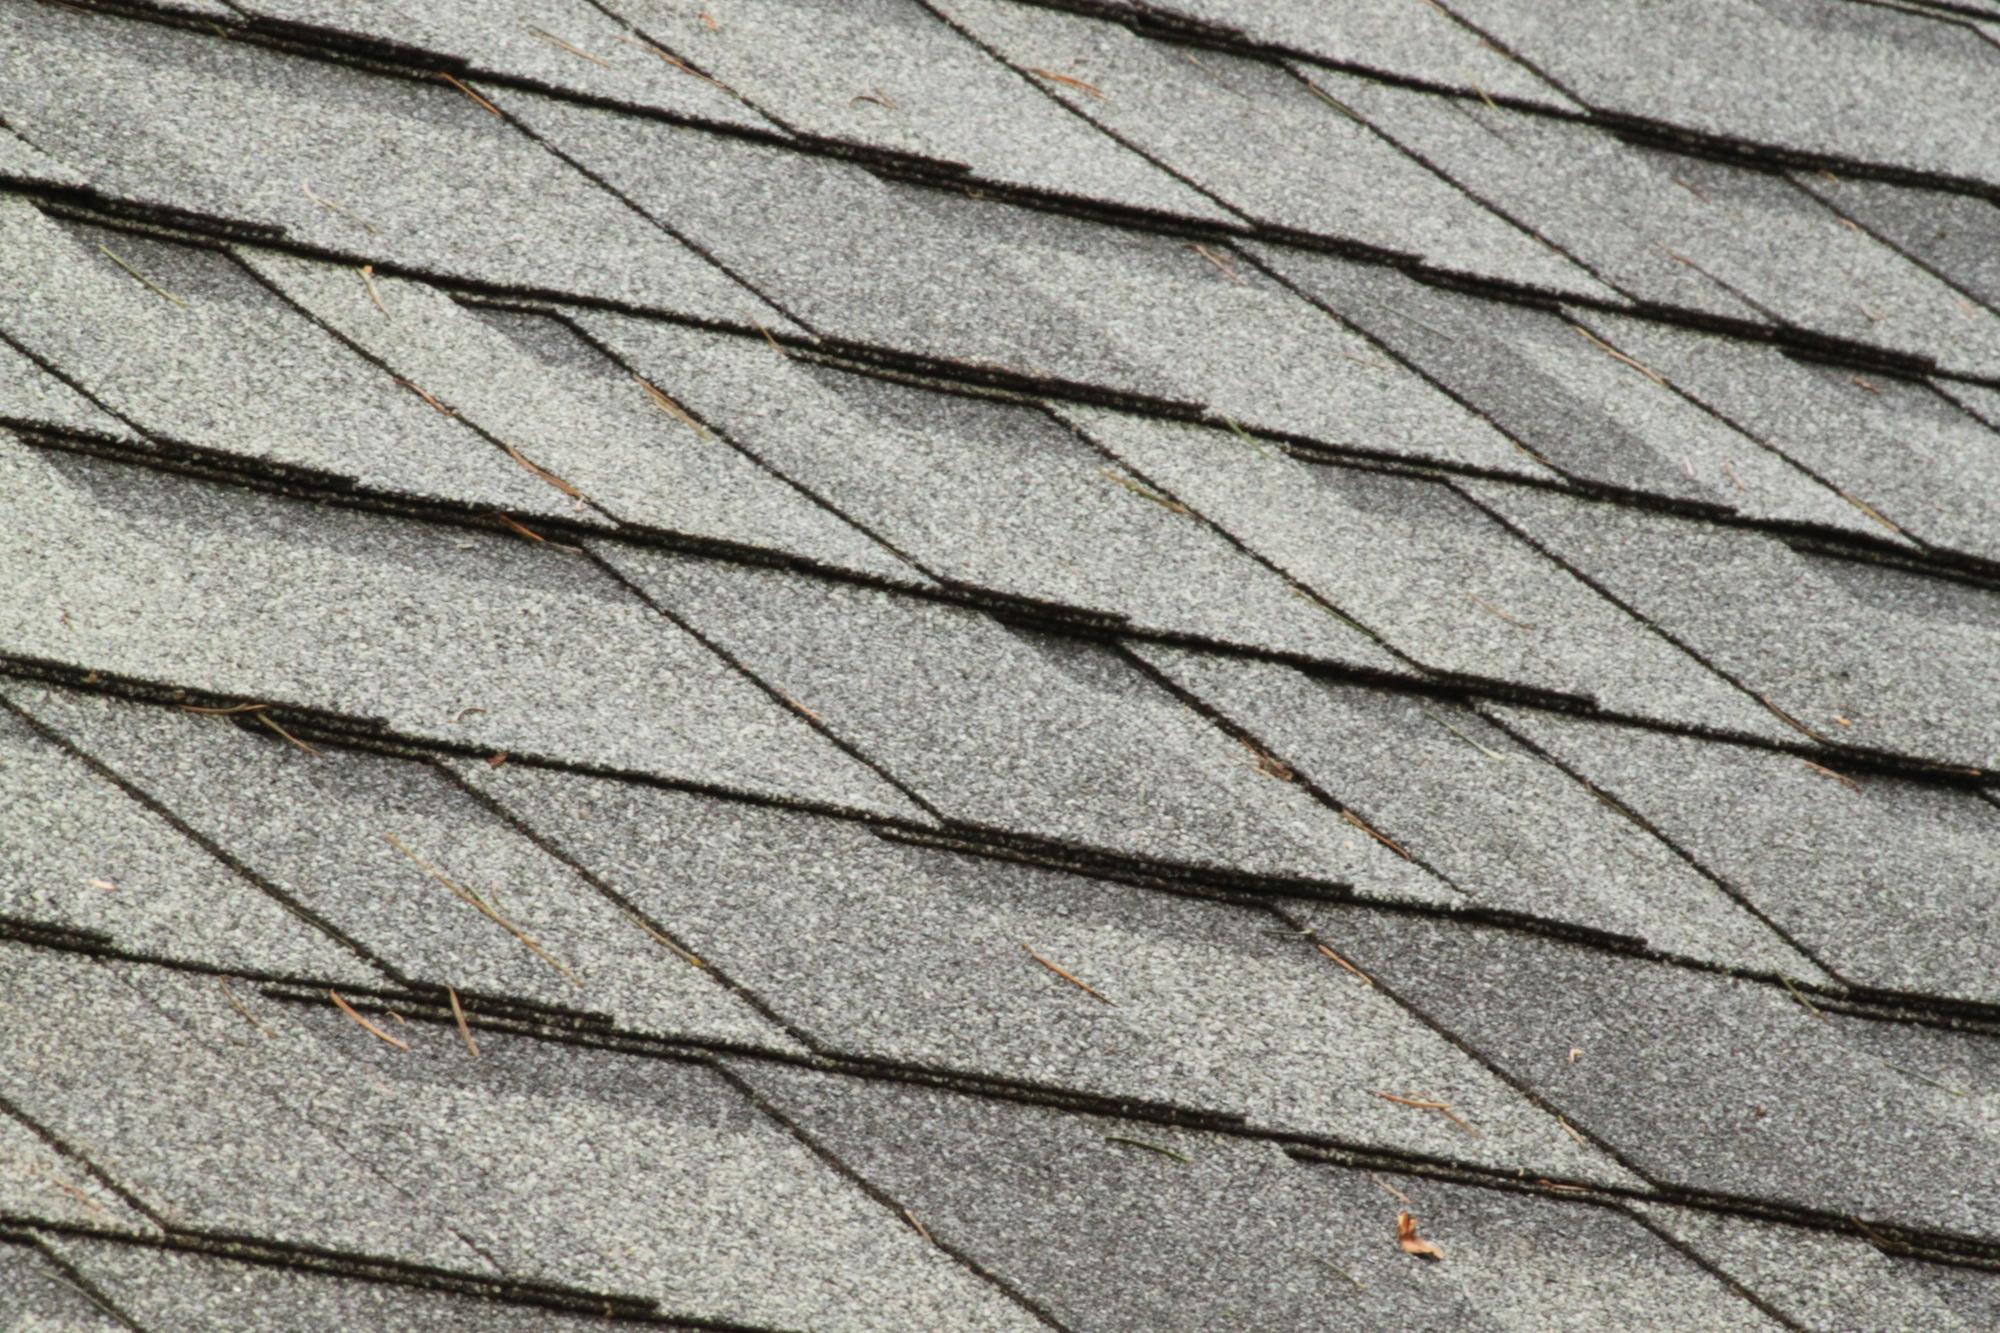 Shingles on roof